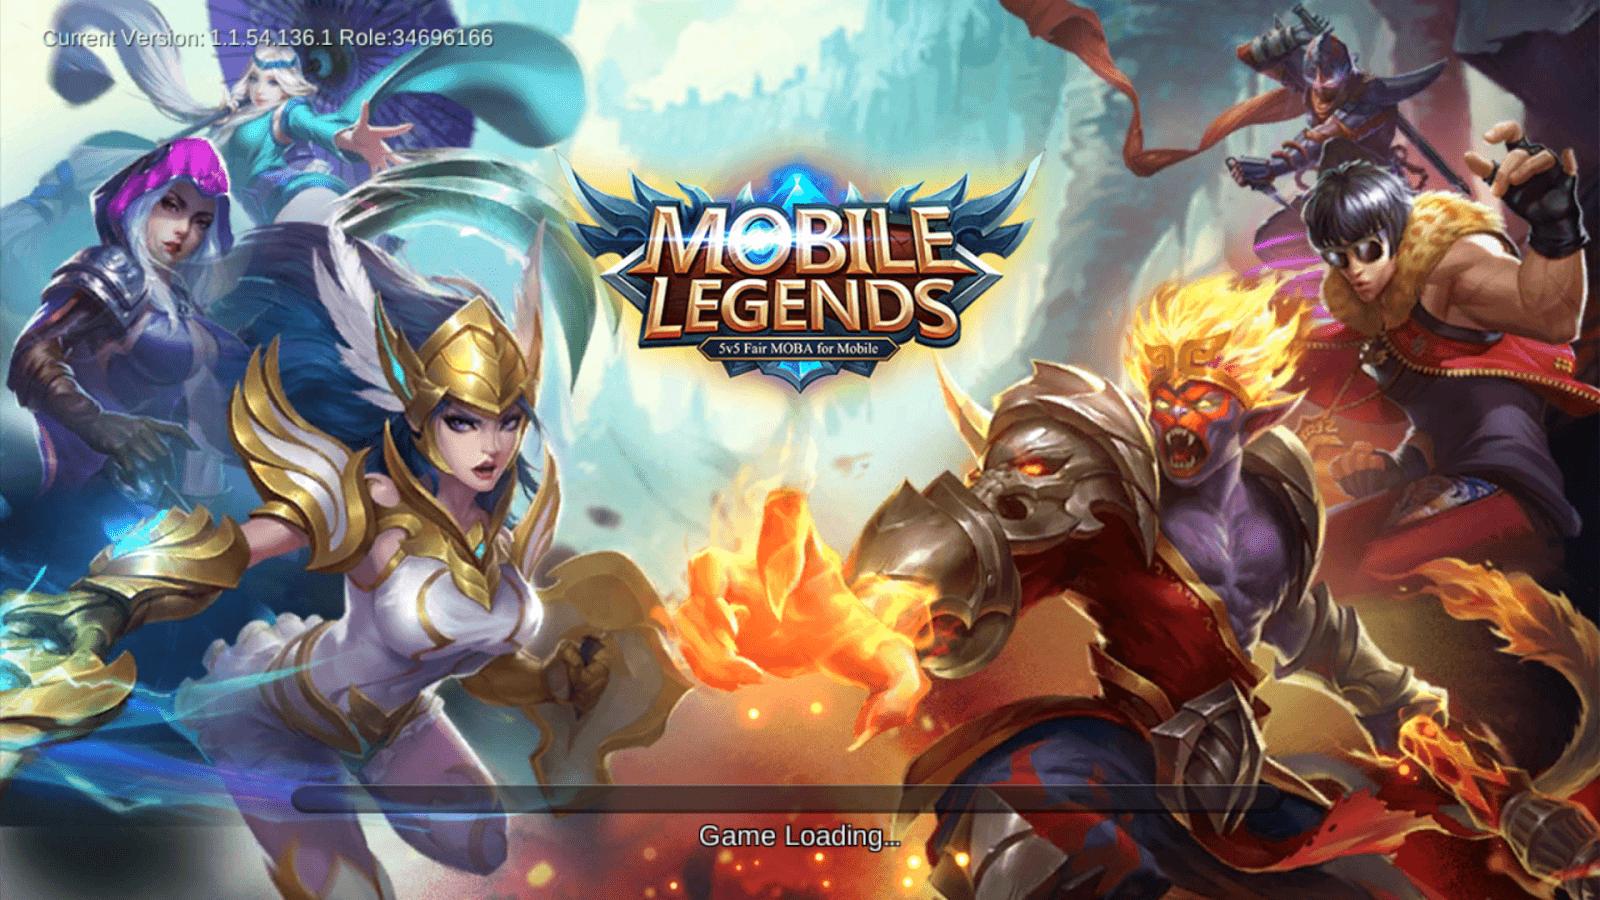 Mobile Legends Wallpapers on WallpaperDog